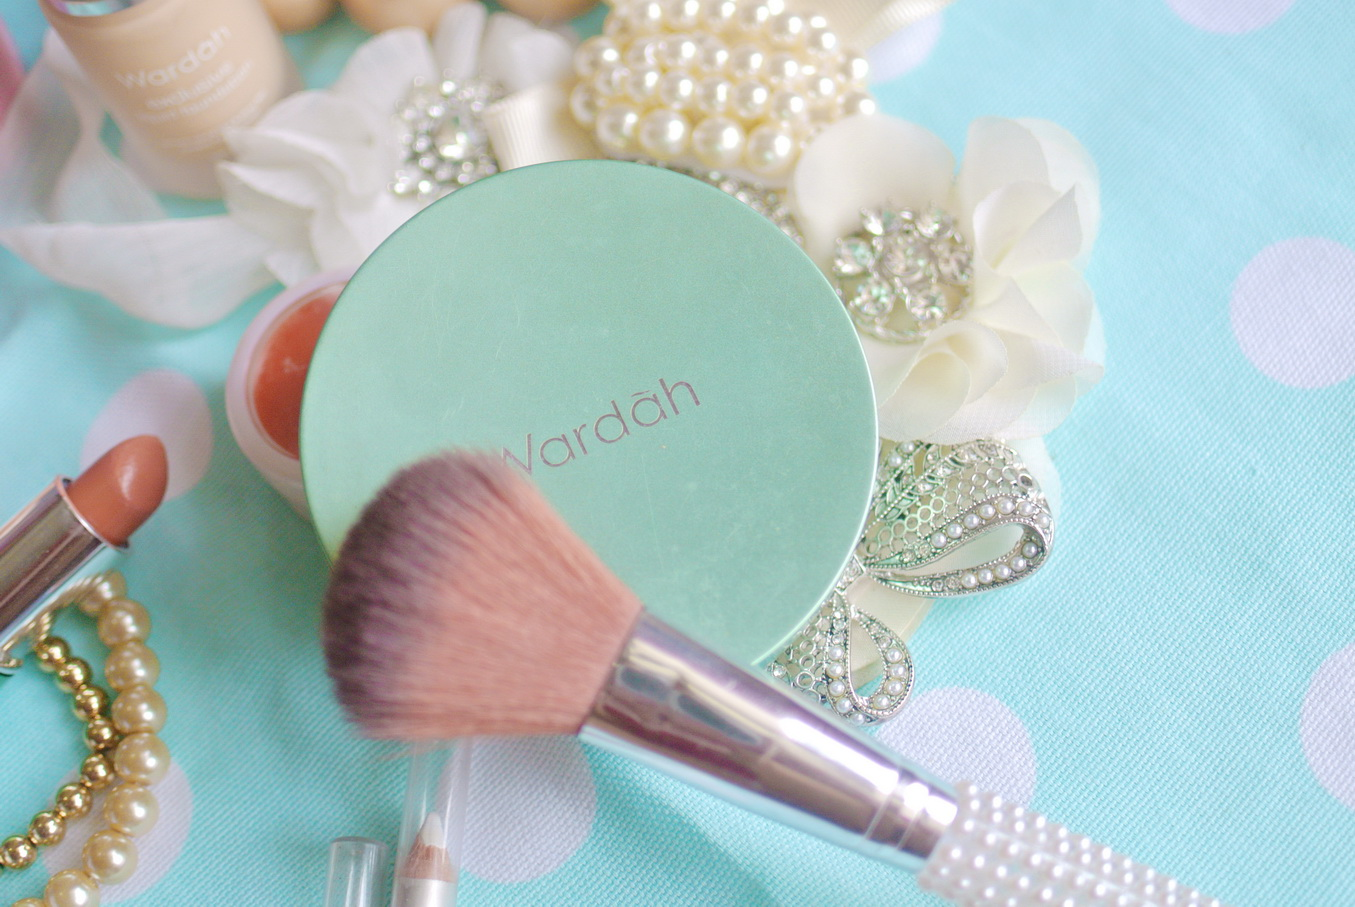 Brain Beauty Belief August 2013 Wardah Blush On Step 3 Apply